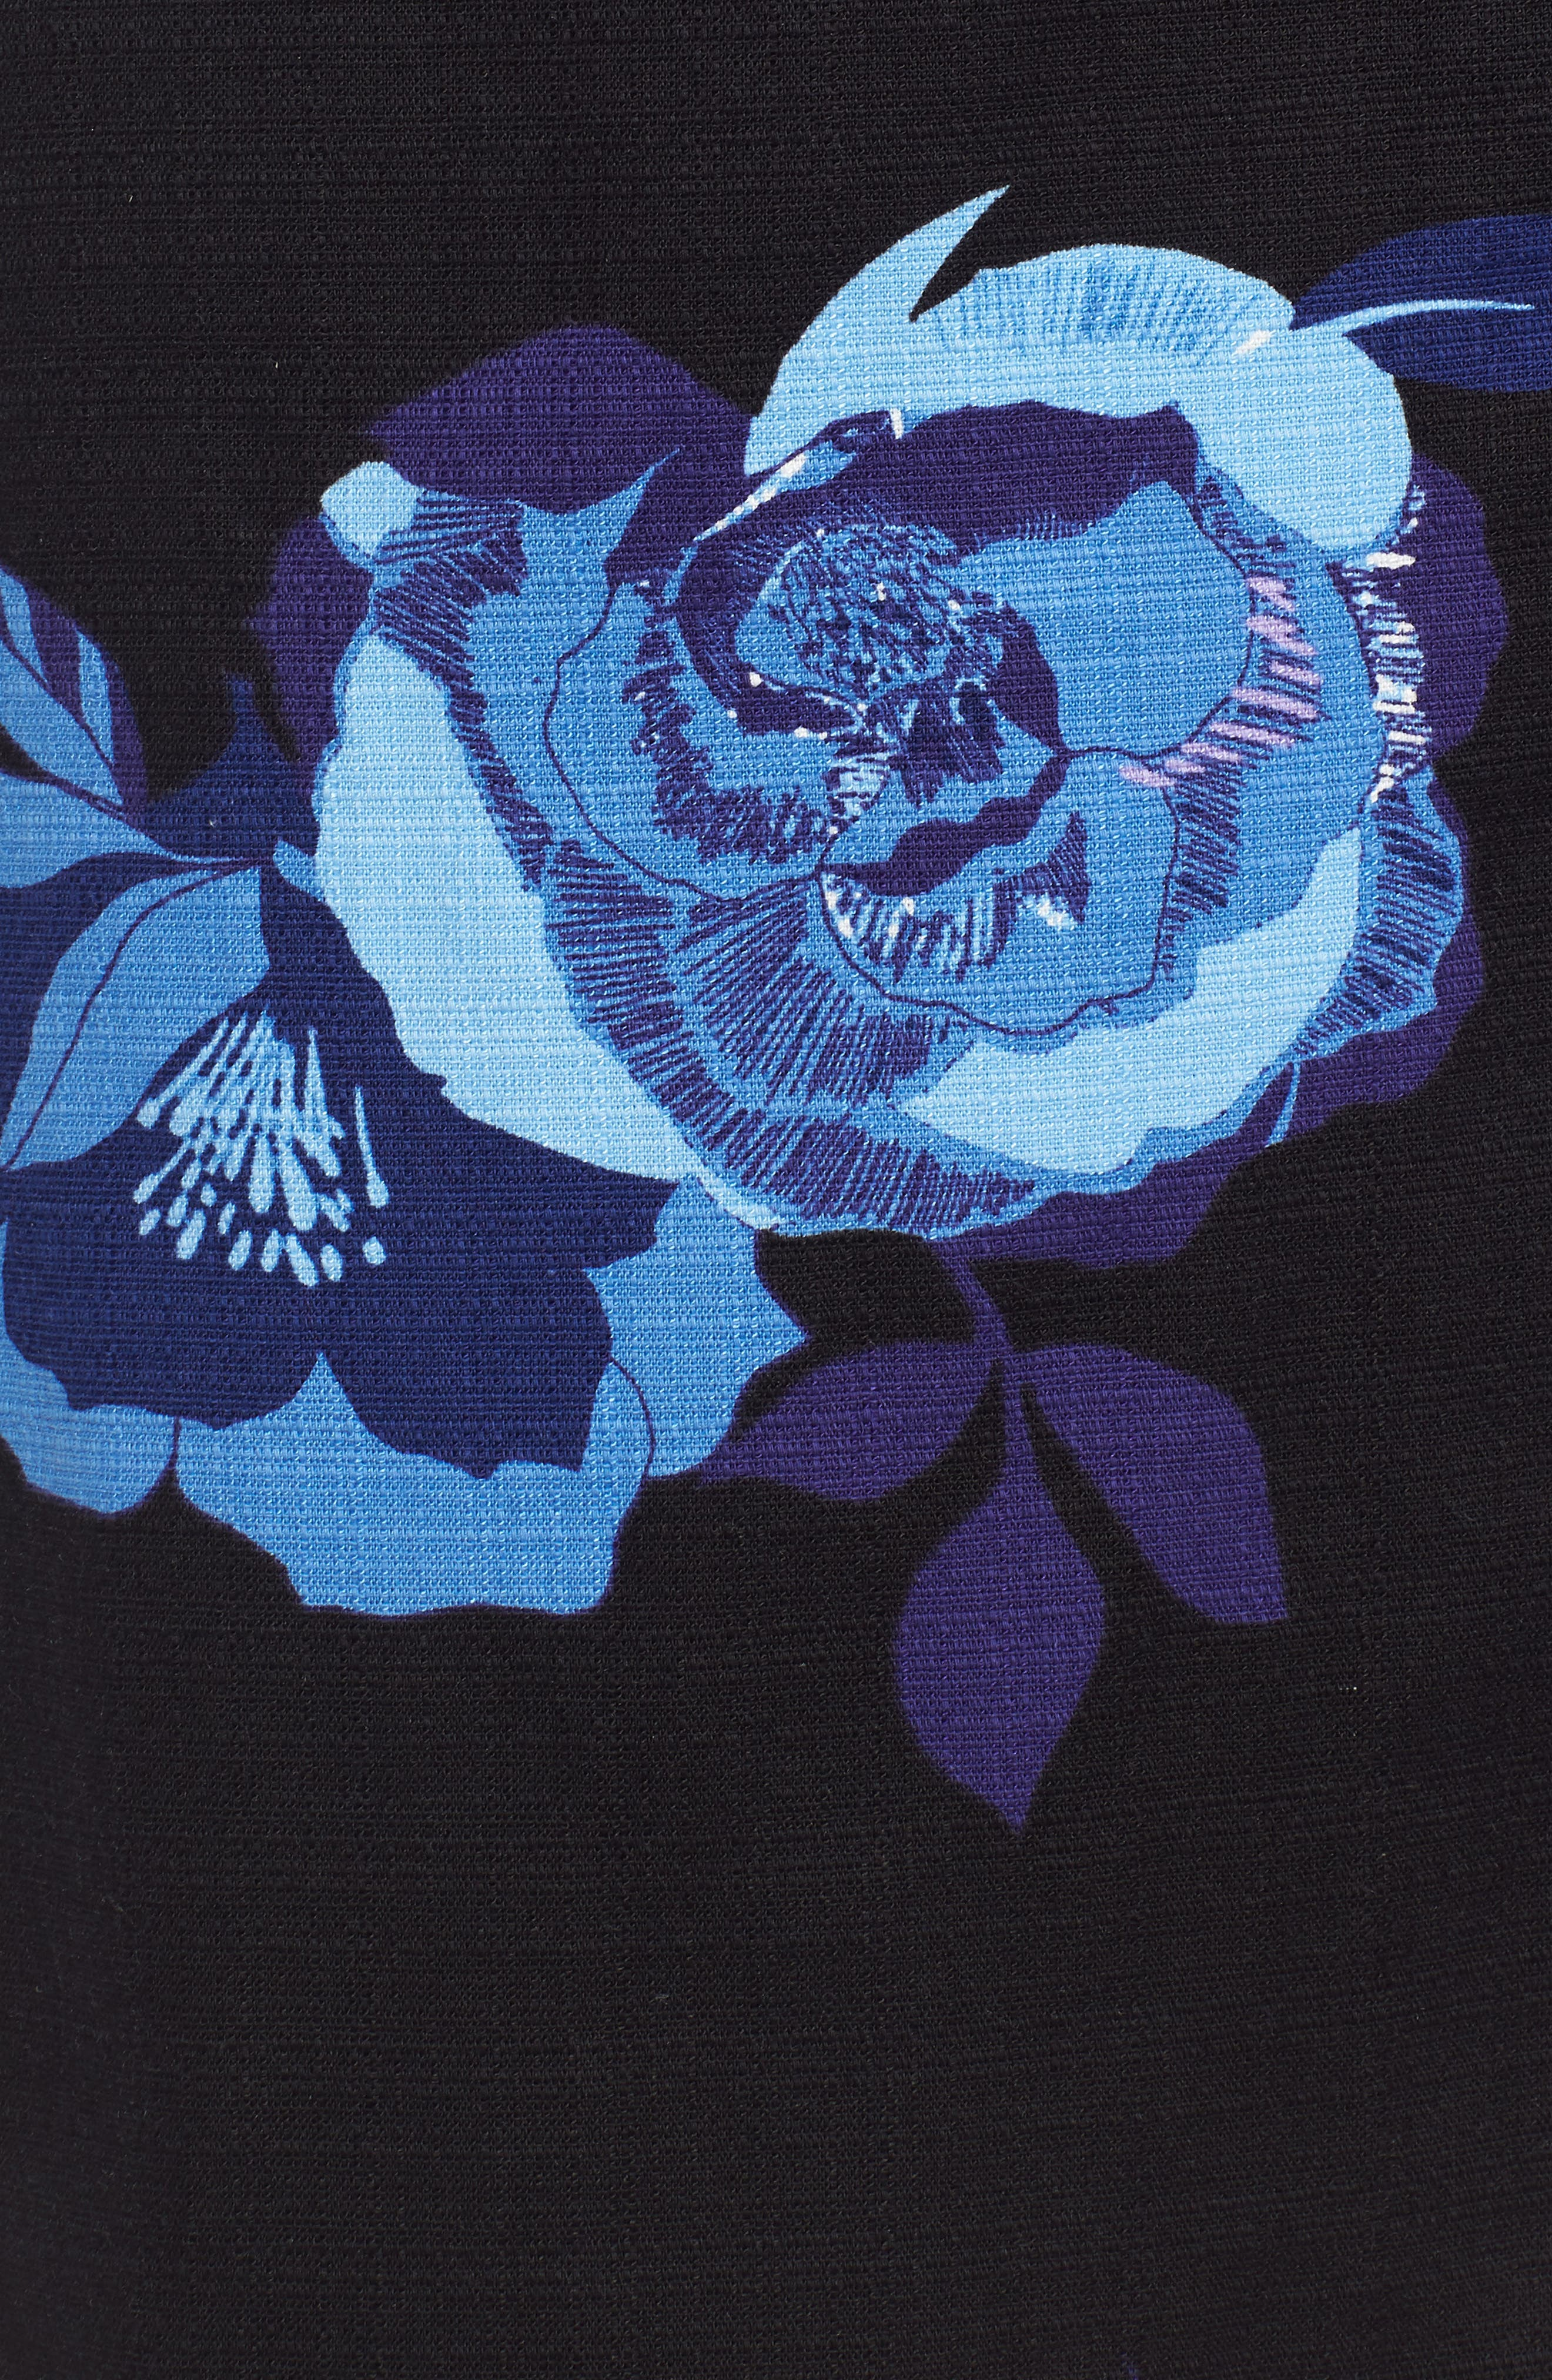 Floral Cotton Blend Wrap Skirt,                             Alternate thumbnail 5, color,                             Black- Blue Rose Print